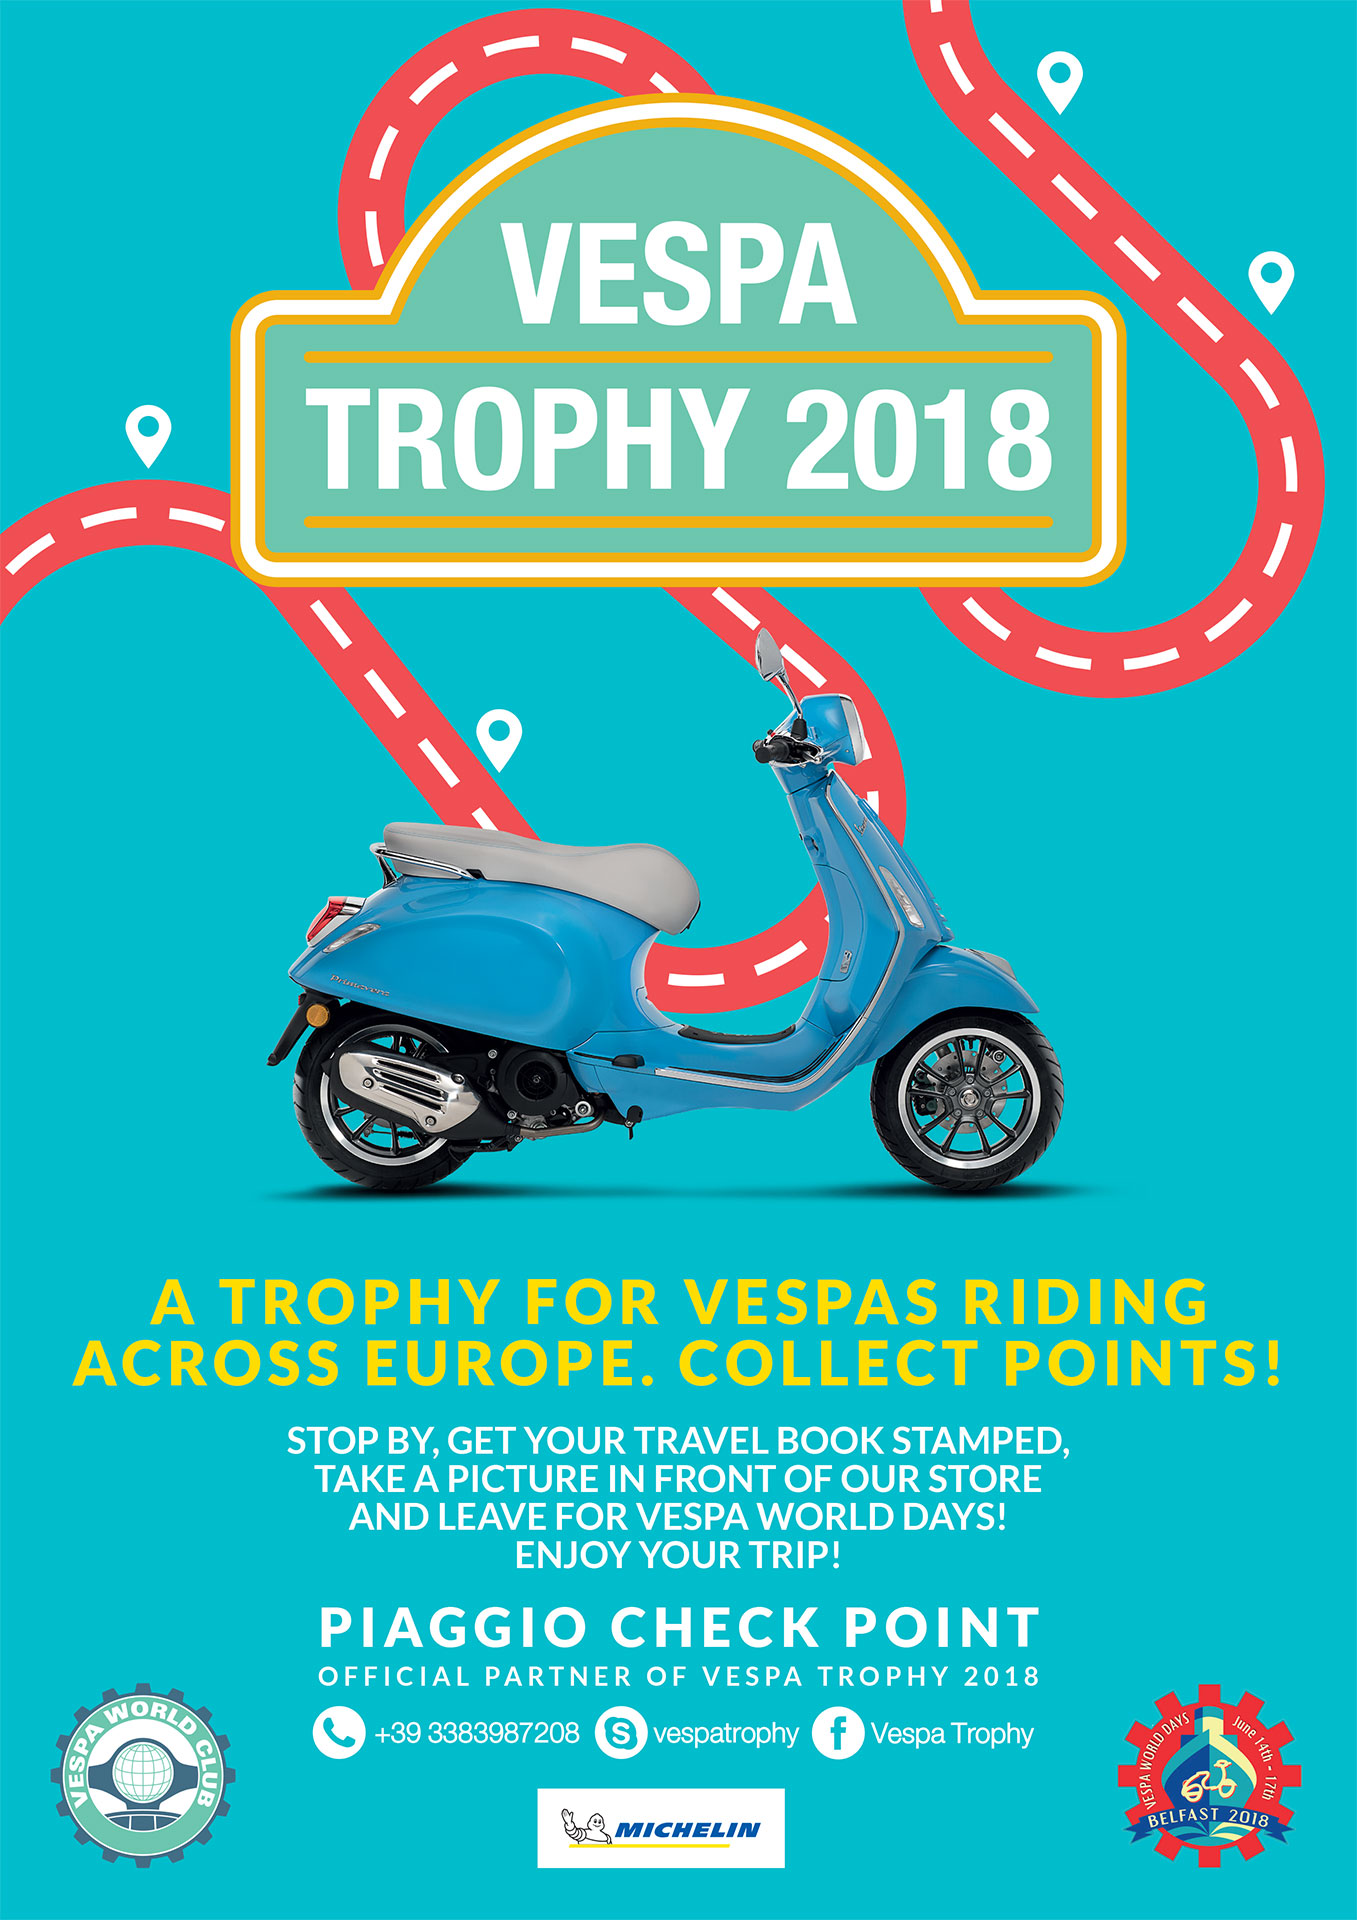 vespa trophy 2018 la clinique du scooter. Black Bedroom Furniture Sets. Home Design Ideas